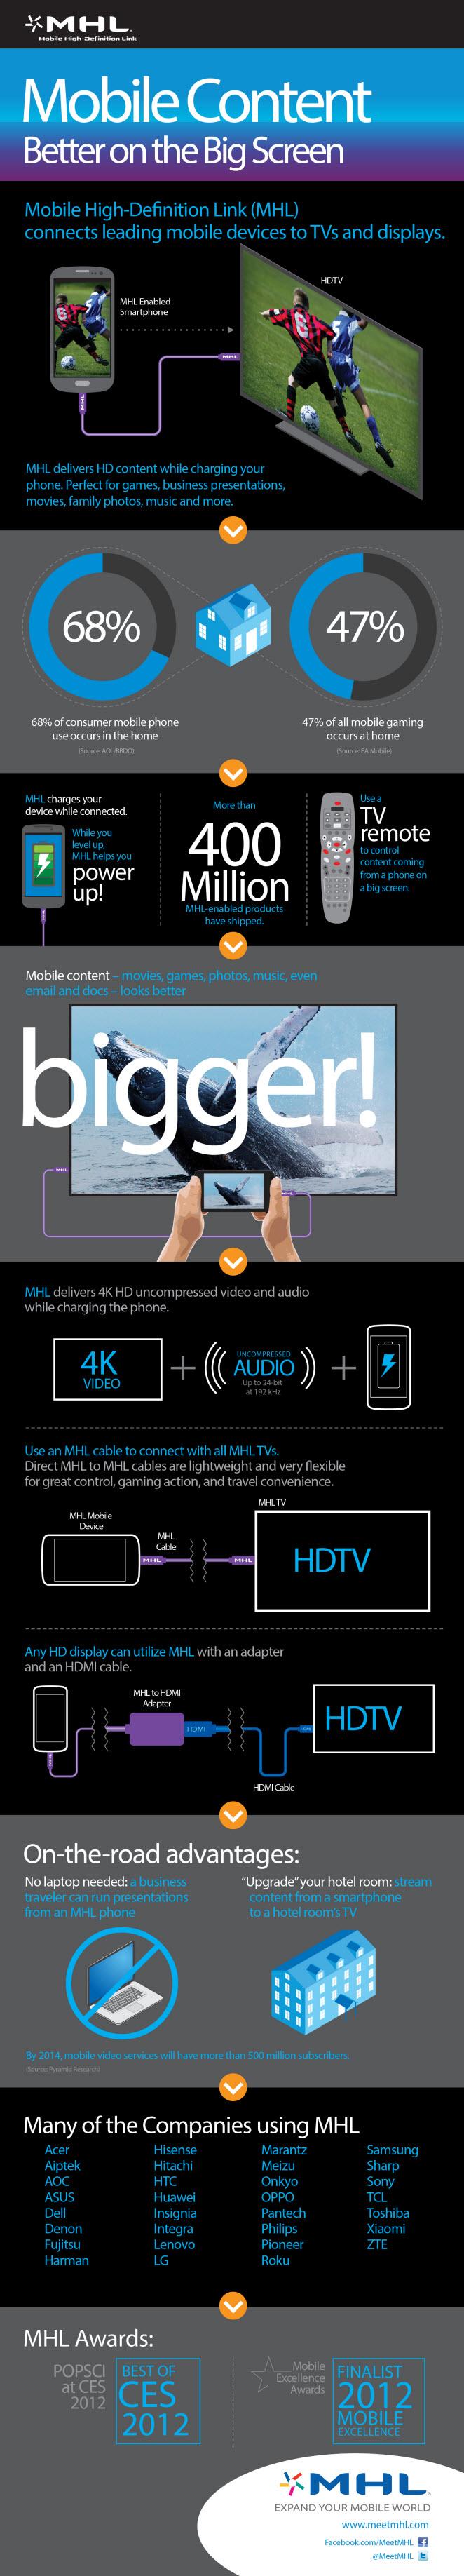 MHL 3.0 infographic